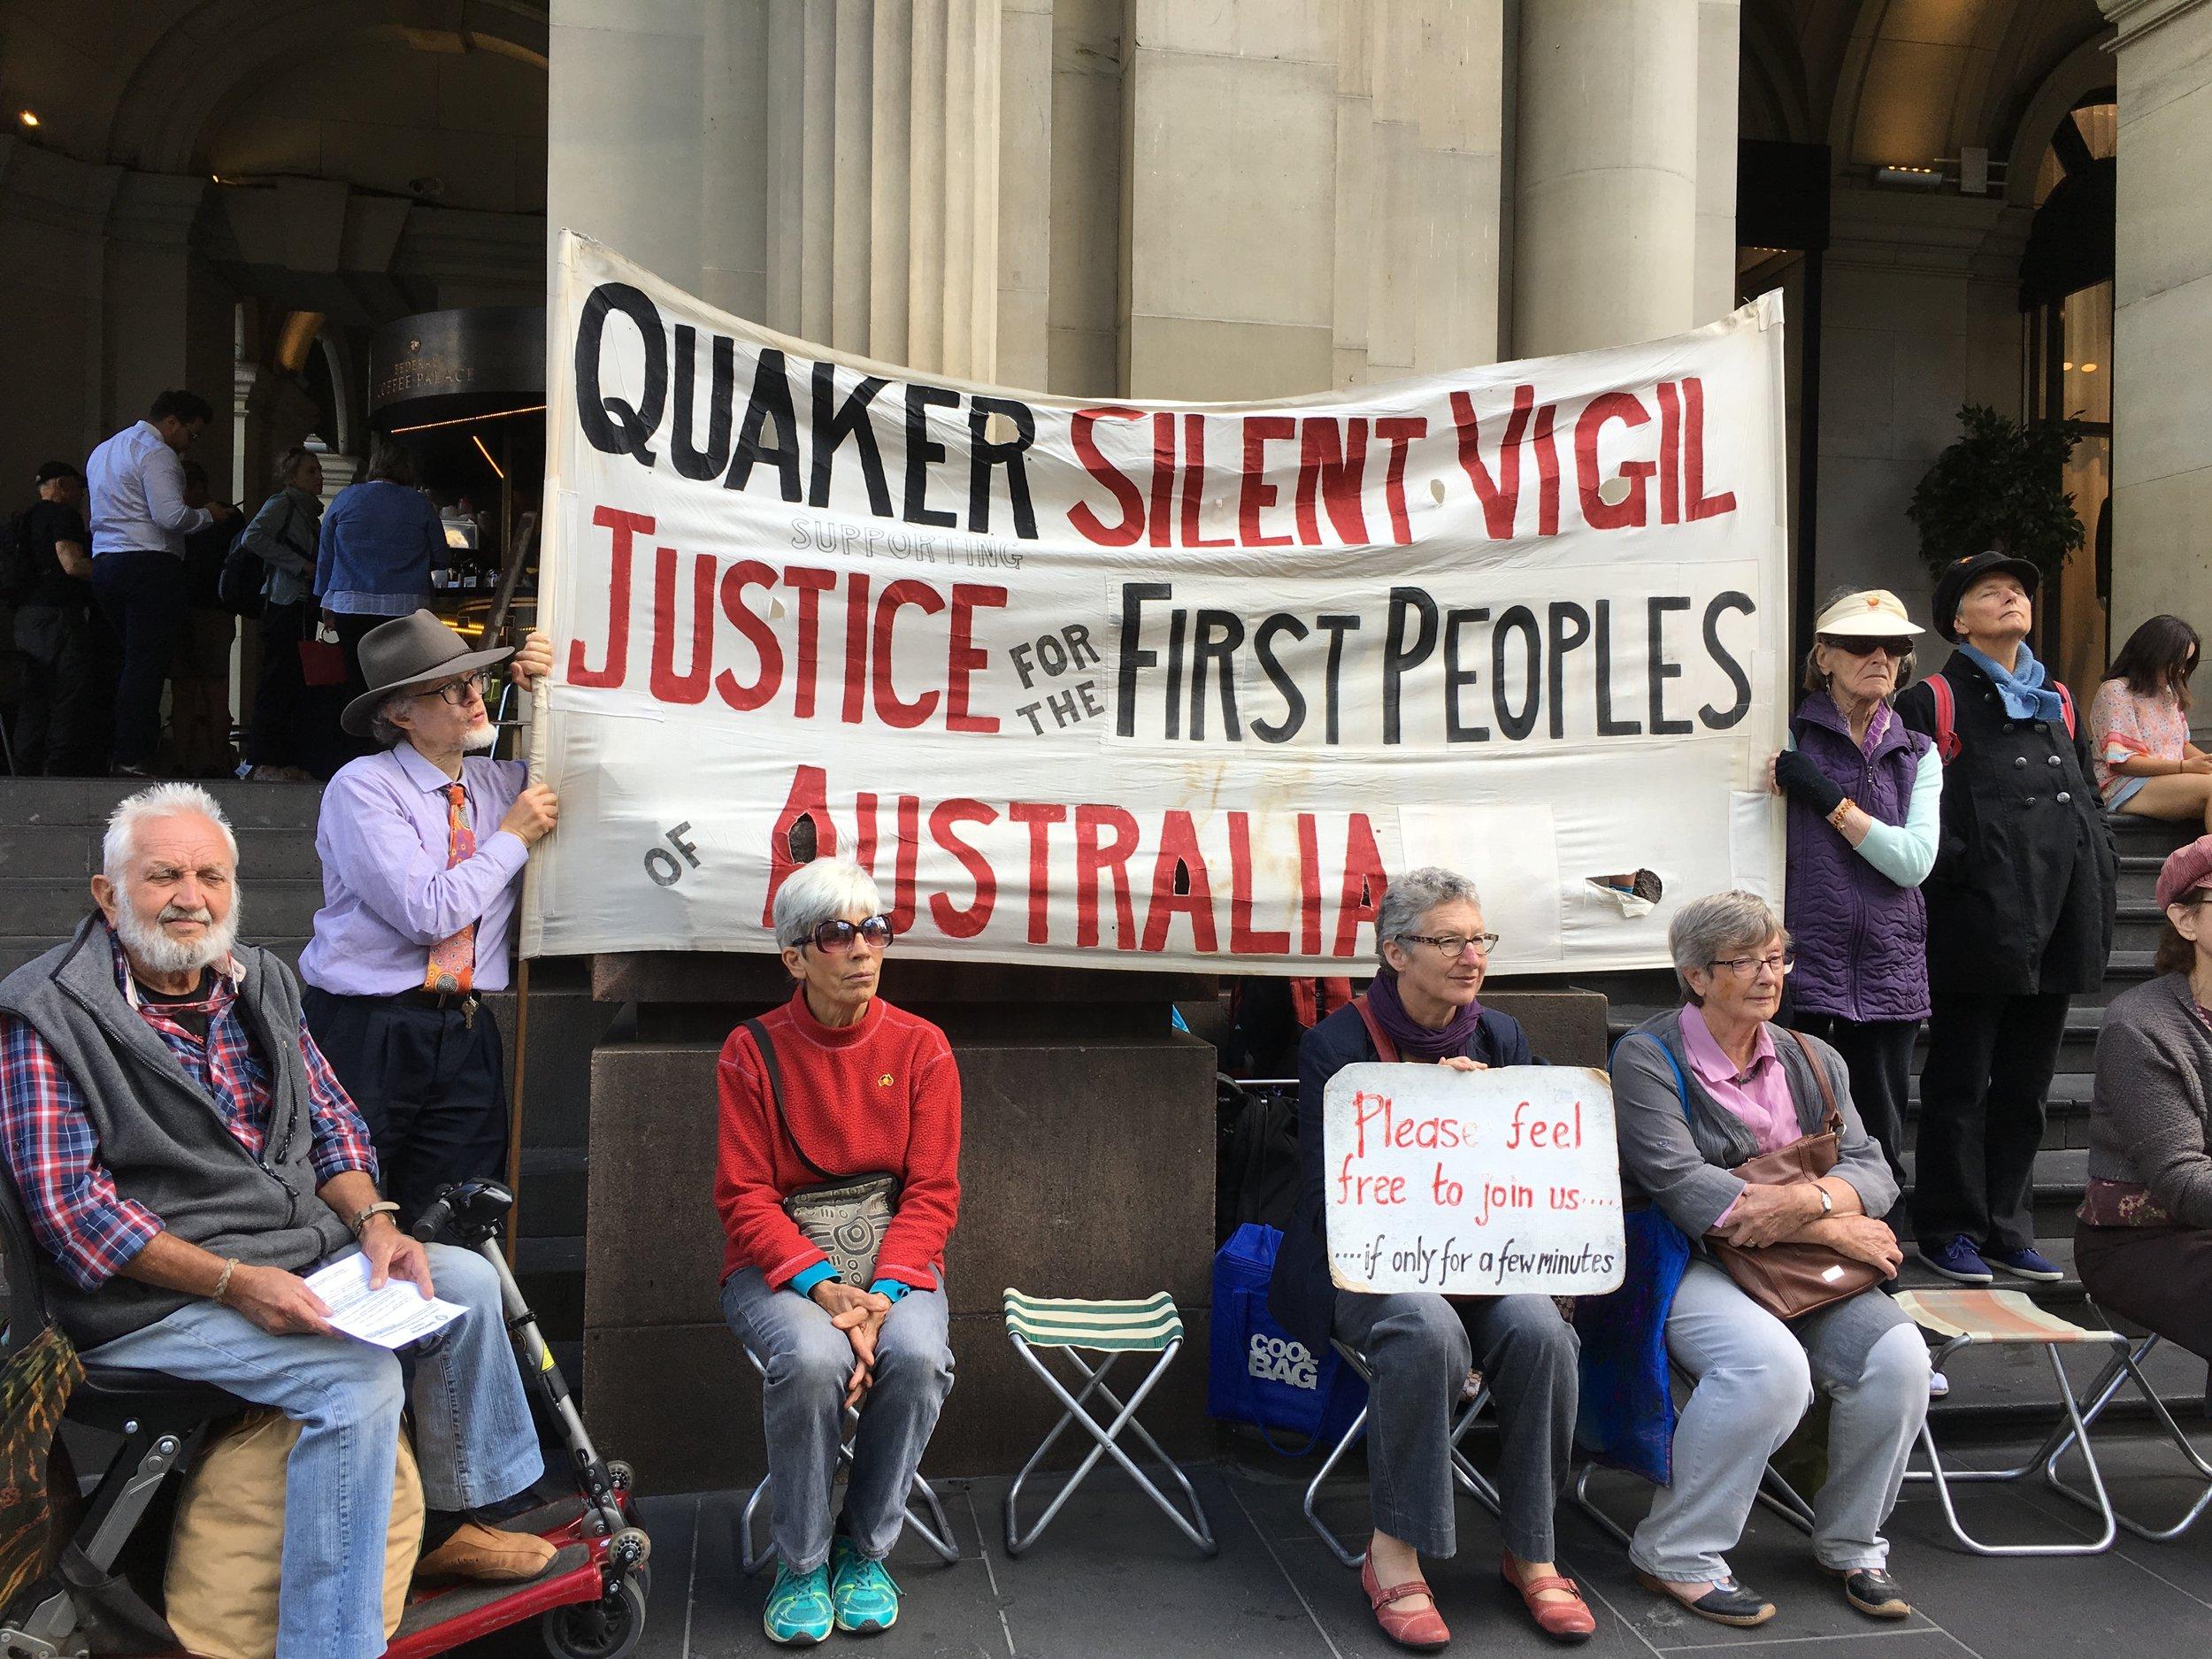 Quaker-silent-vigil2.JPG